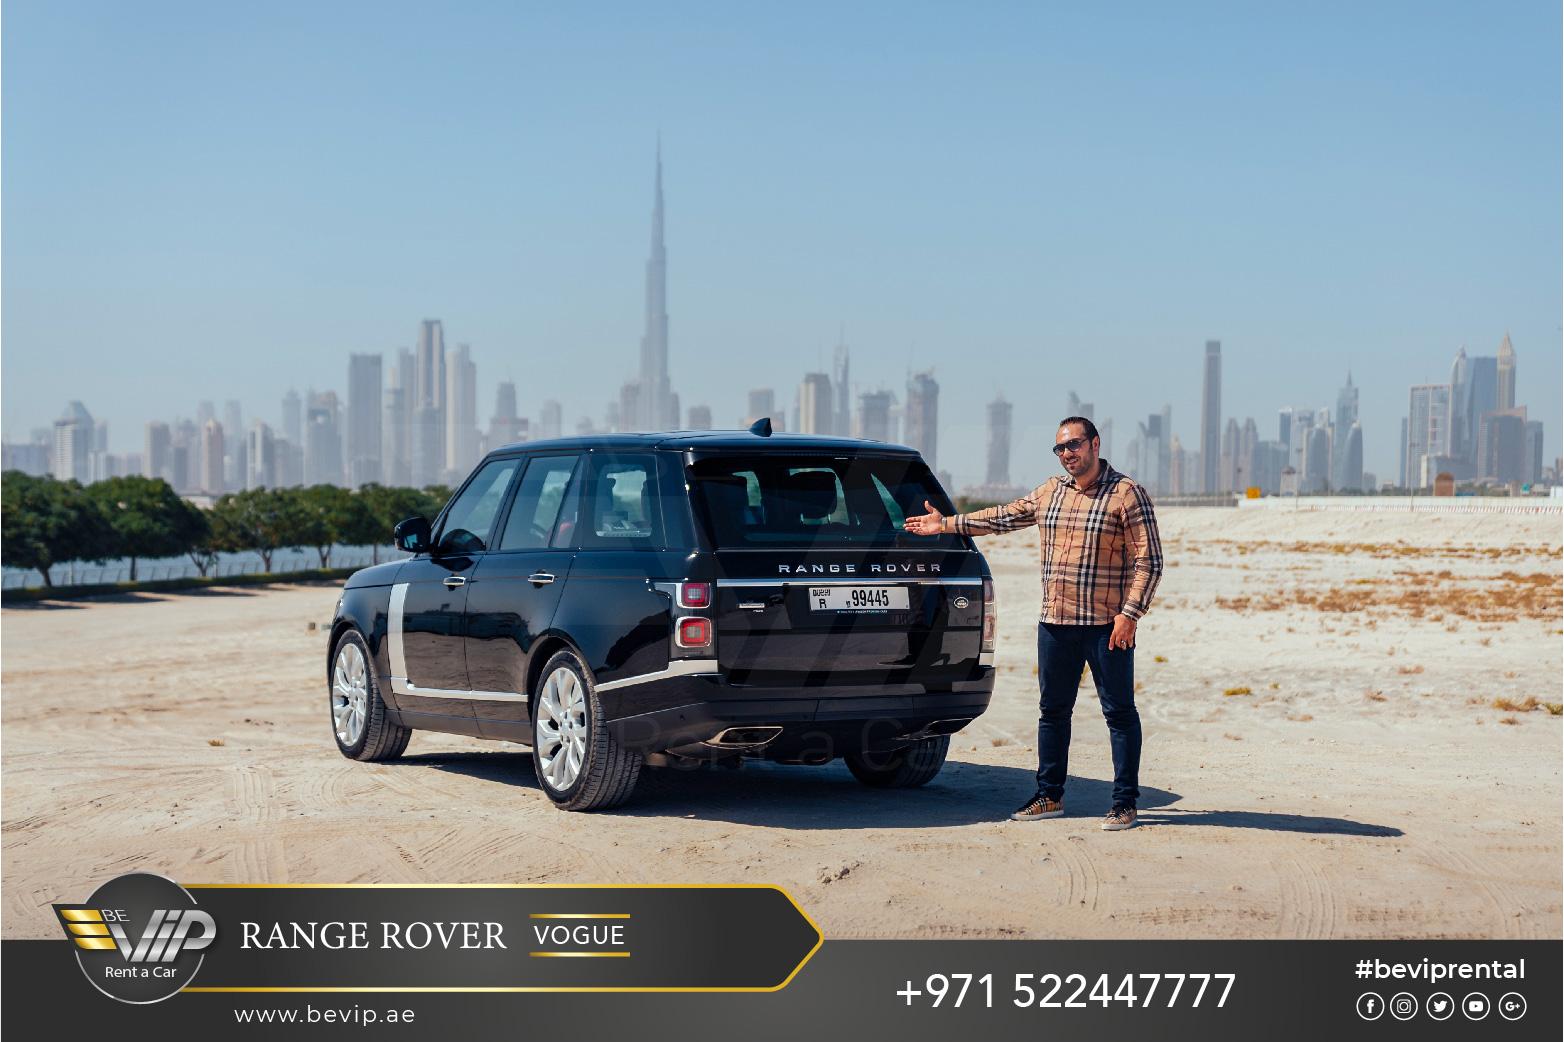 Luxury-car-rental-in-dubai_Range-Rover-for-rent-in-Dubai_-21.jpg